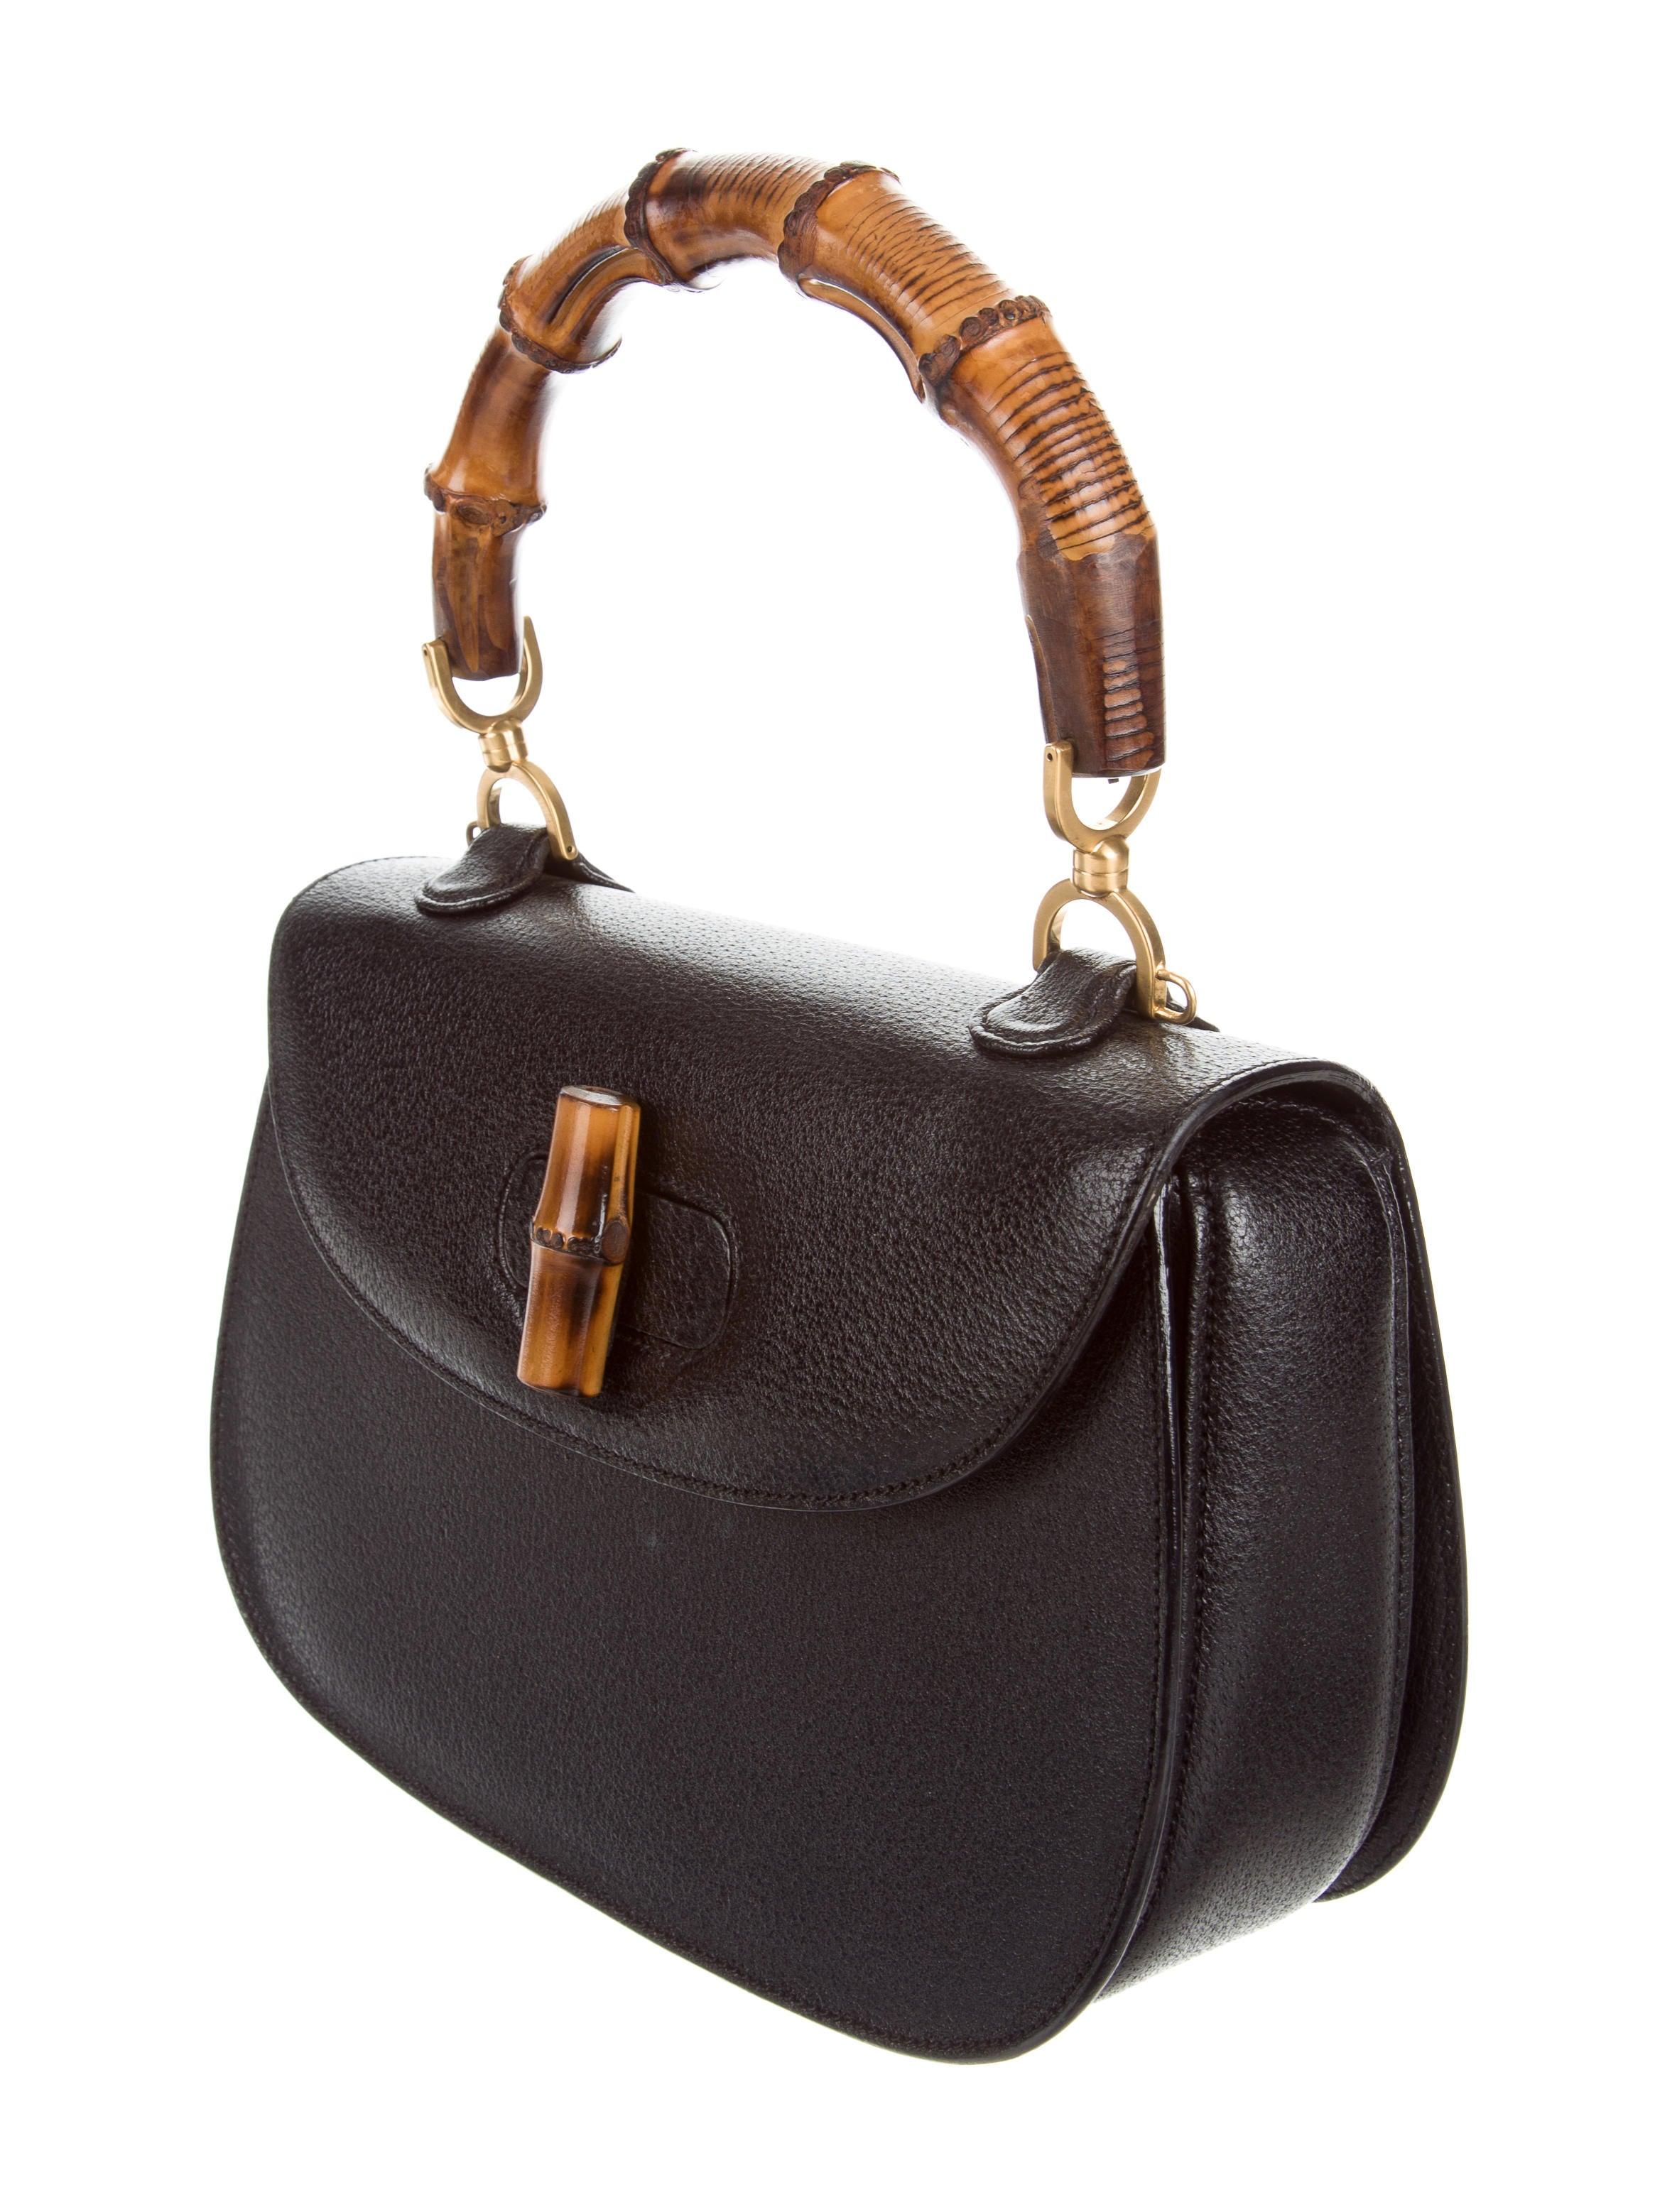 40b36916bd12 Gucci Vintage Bamboo Top Handle Bag - Handbags - GUC160293 | The RealReal